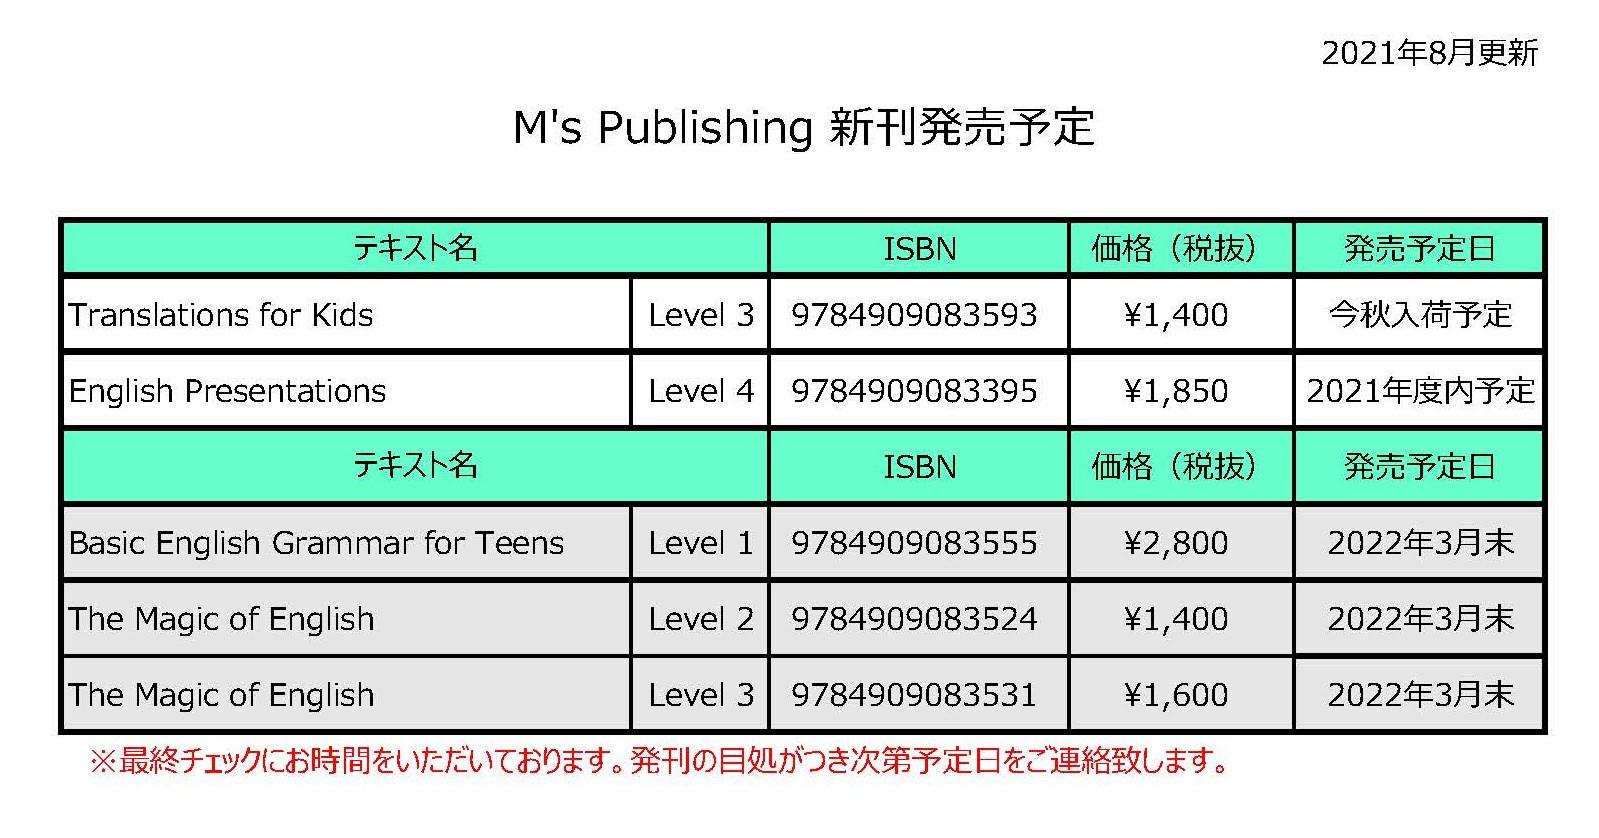 M's Publishing 新刊発売予定のお知らせ